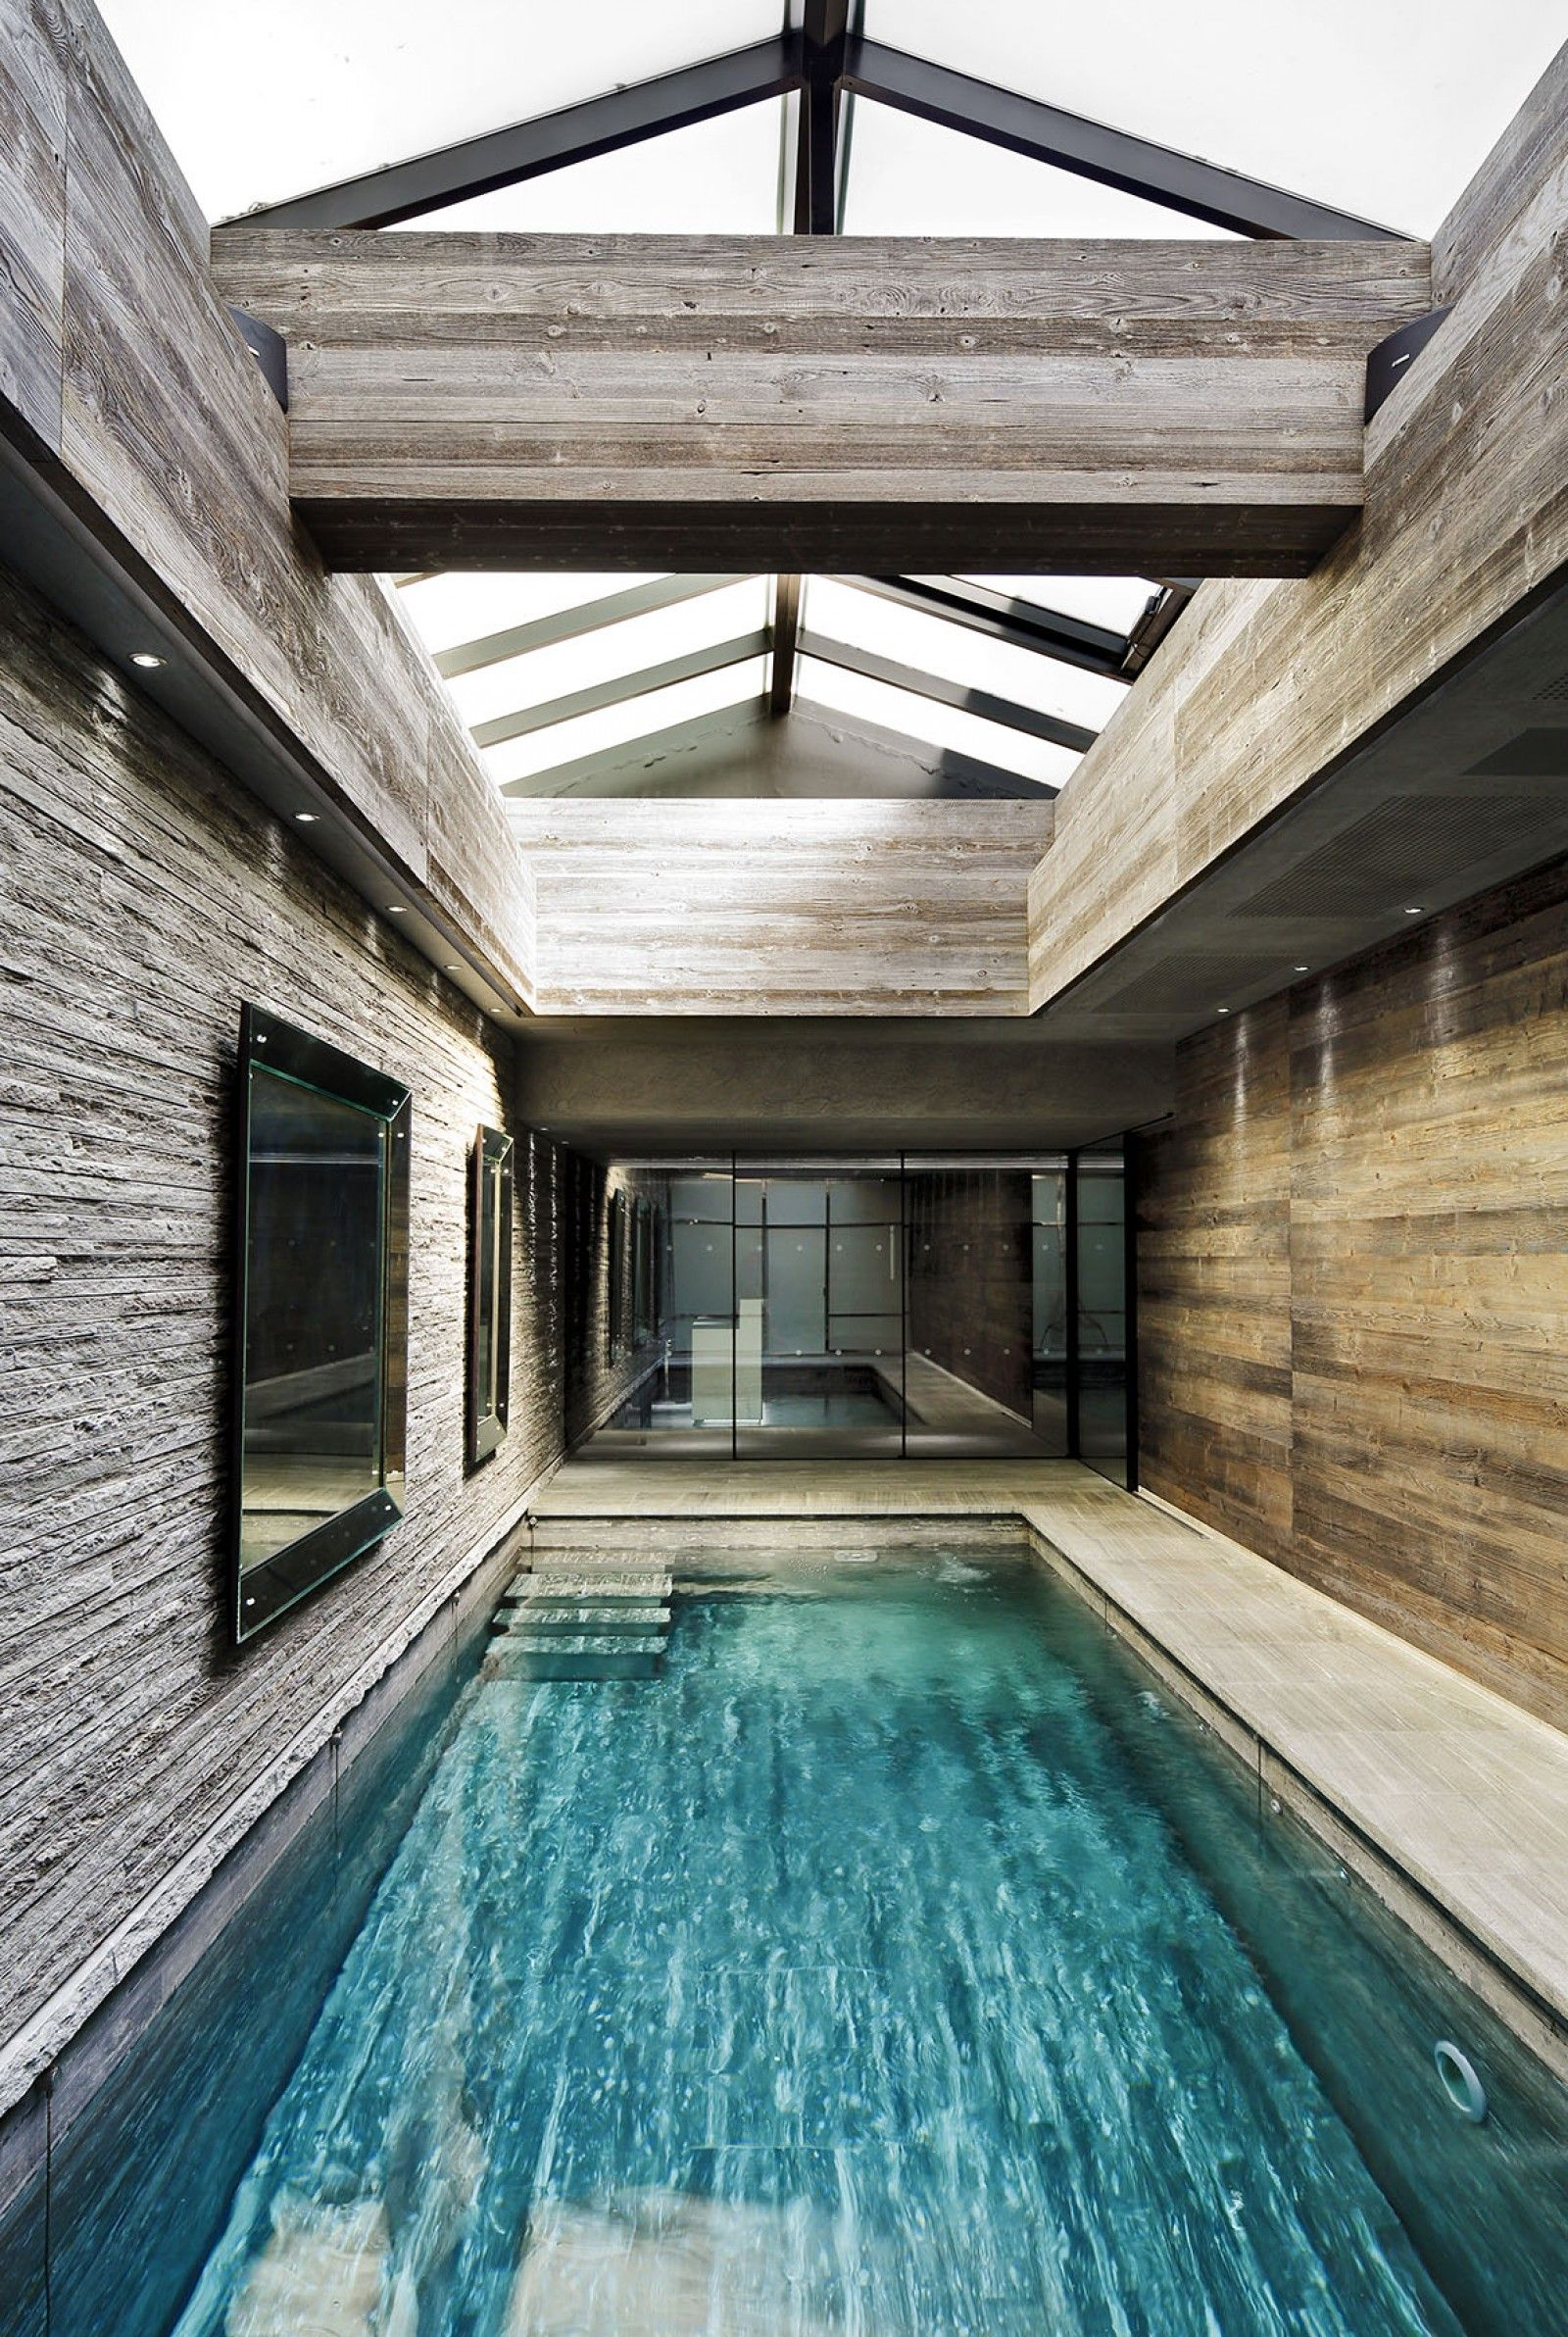 Studio sarah lavoine h tel particulier paris 7 me for Hotel design paris 8